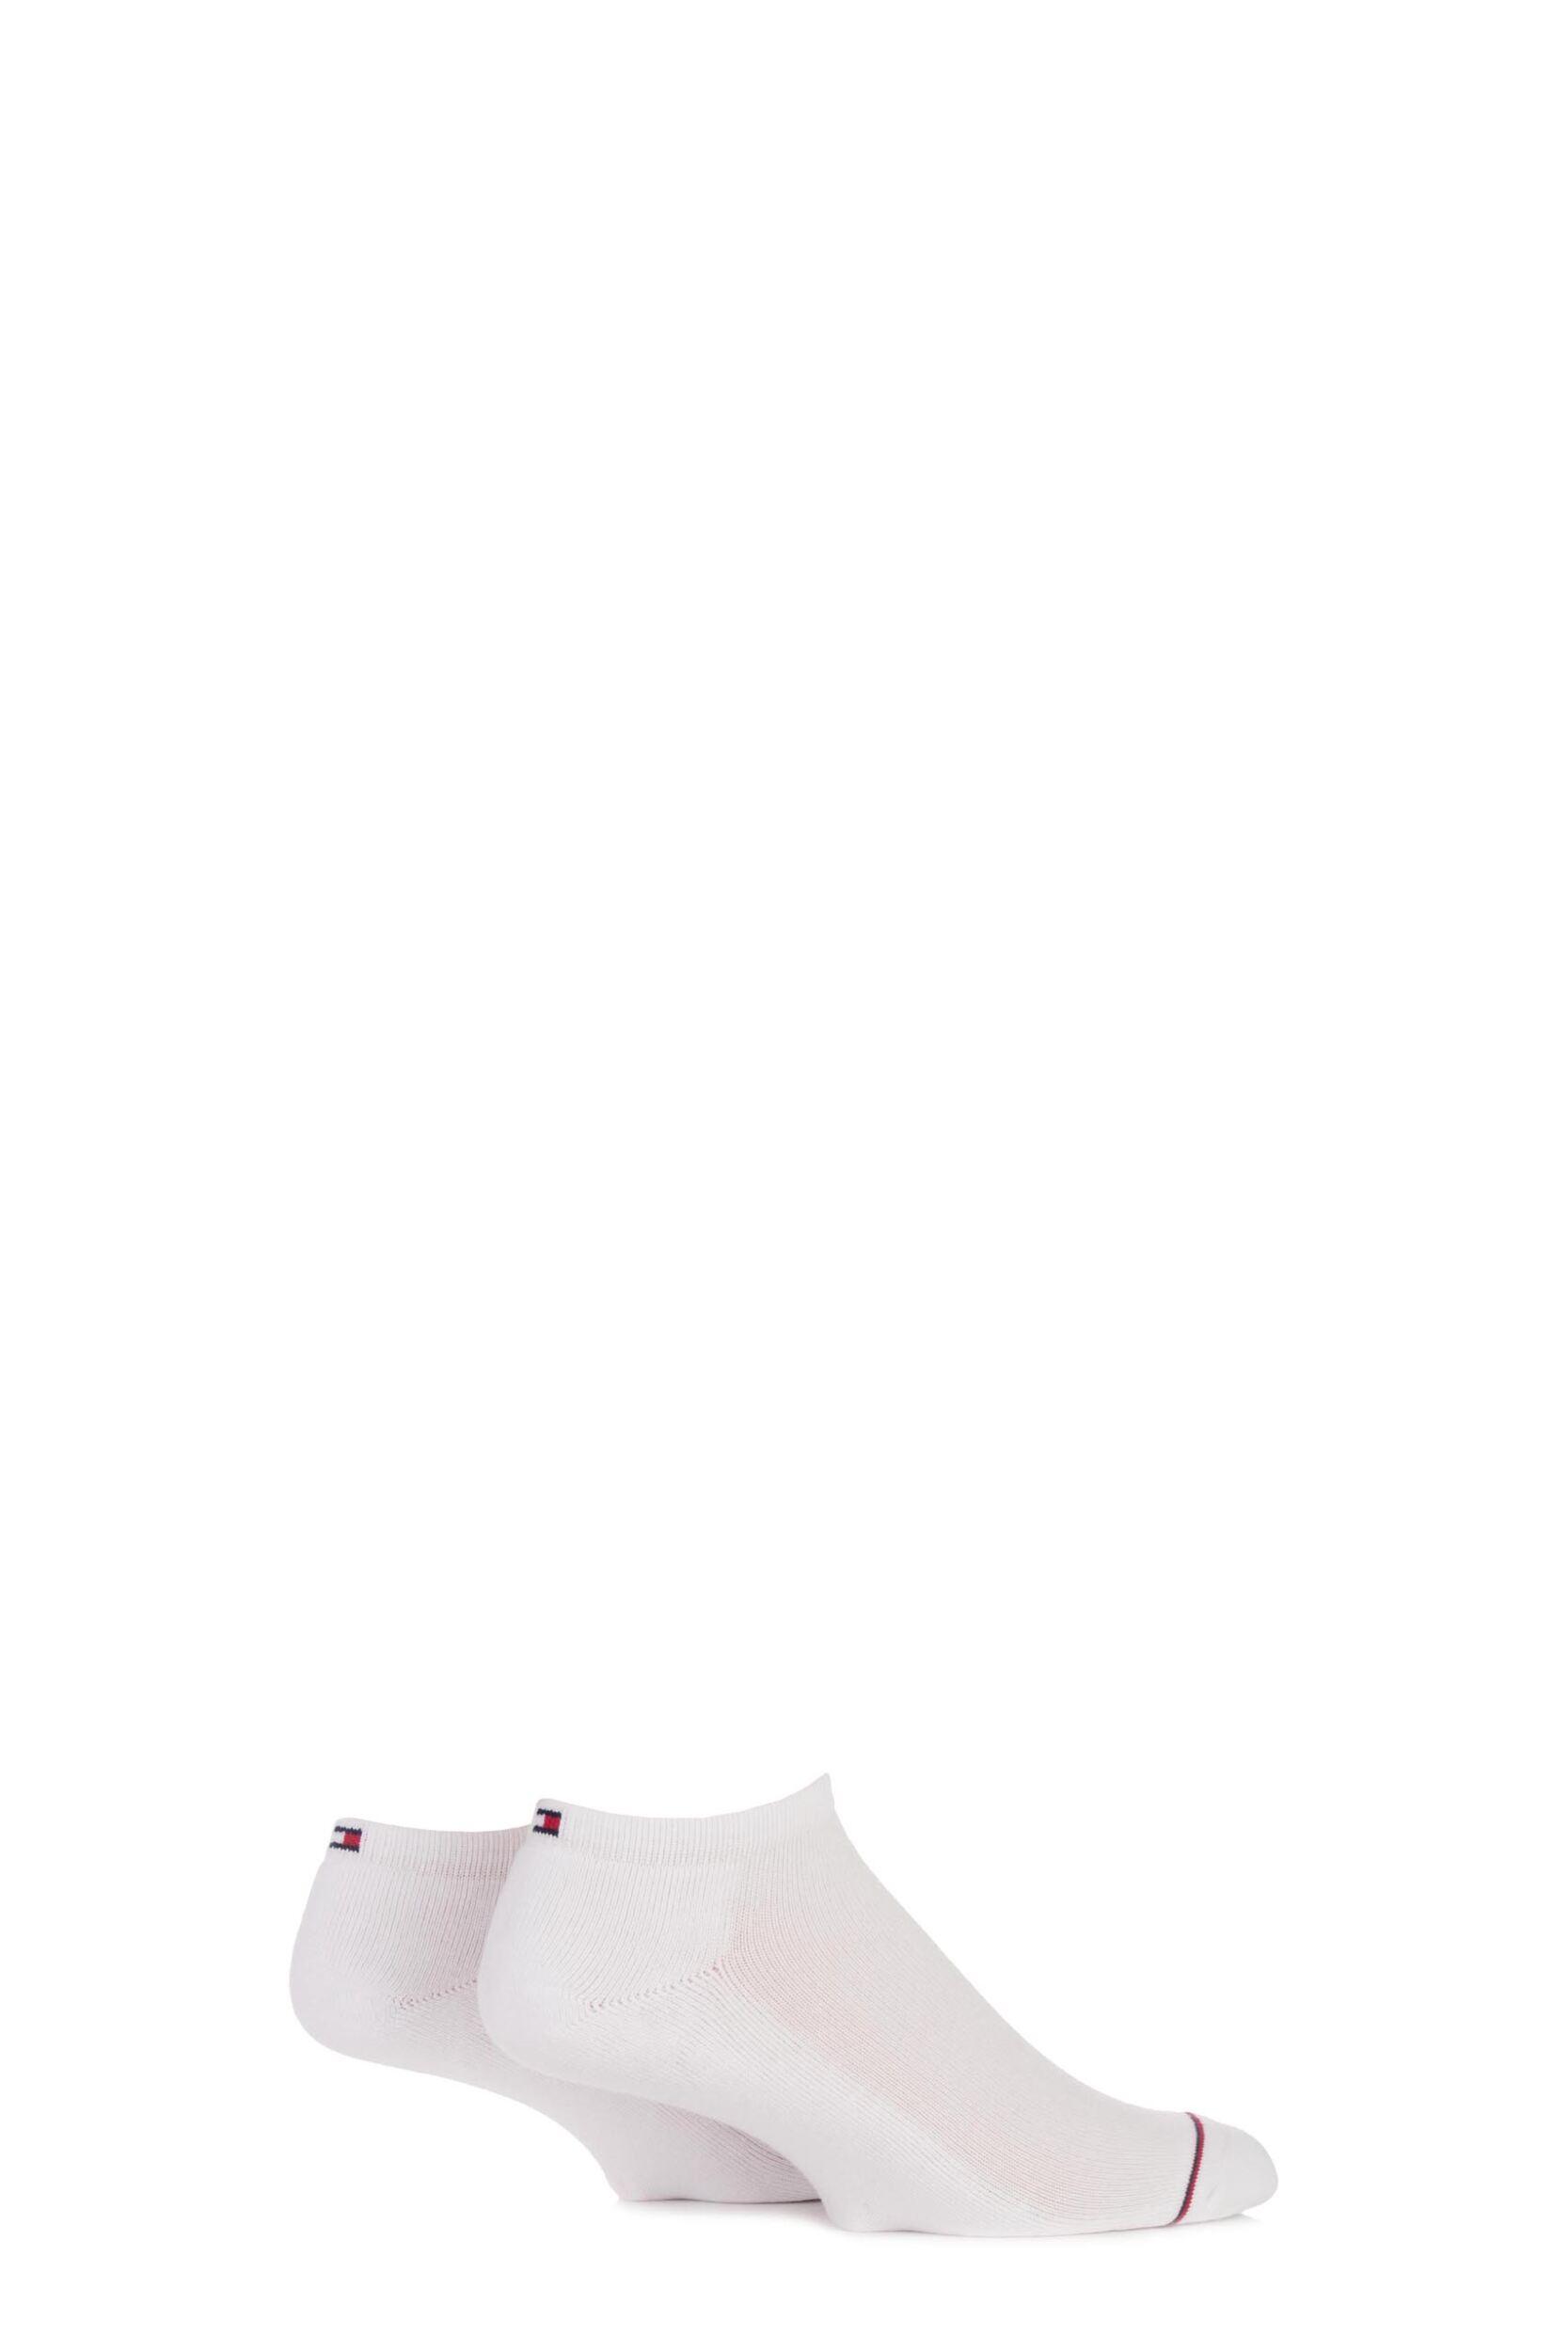 Mens 2 Pair Tommy Hilfiger Cotton Sneaker Sports Socks